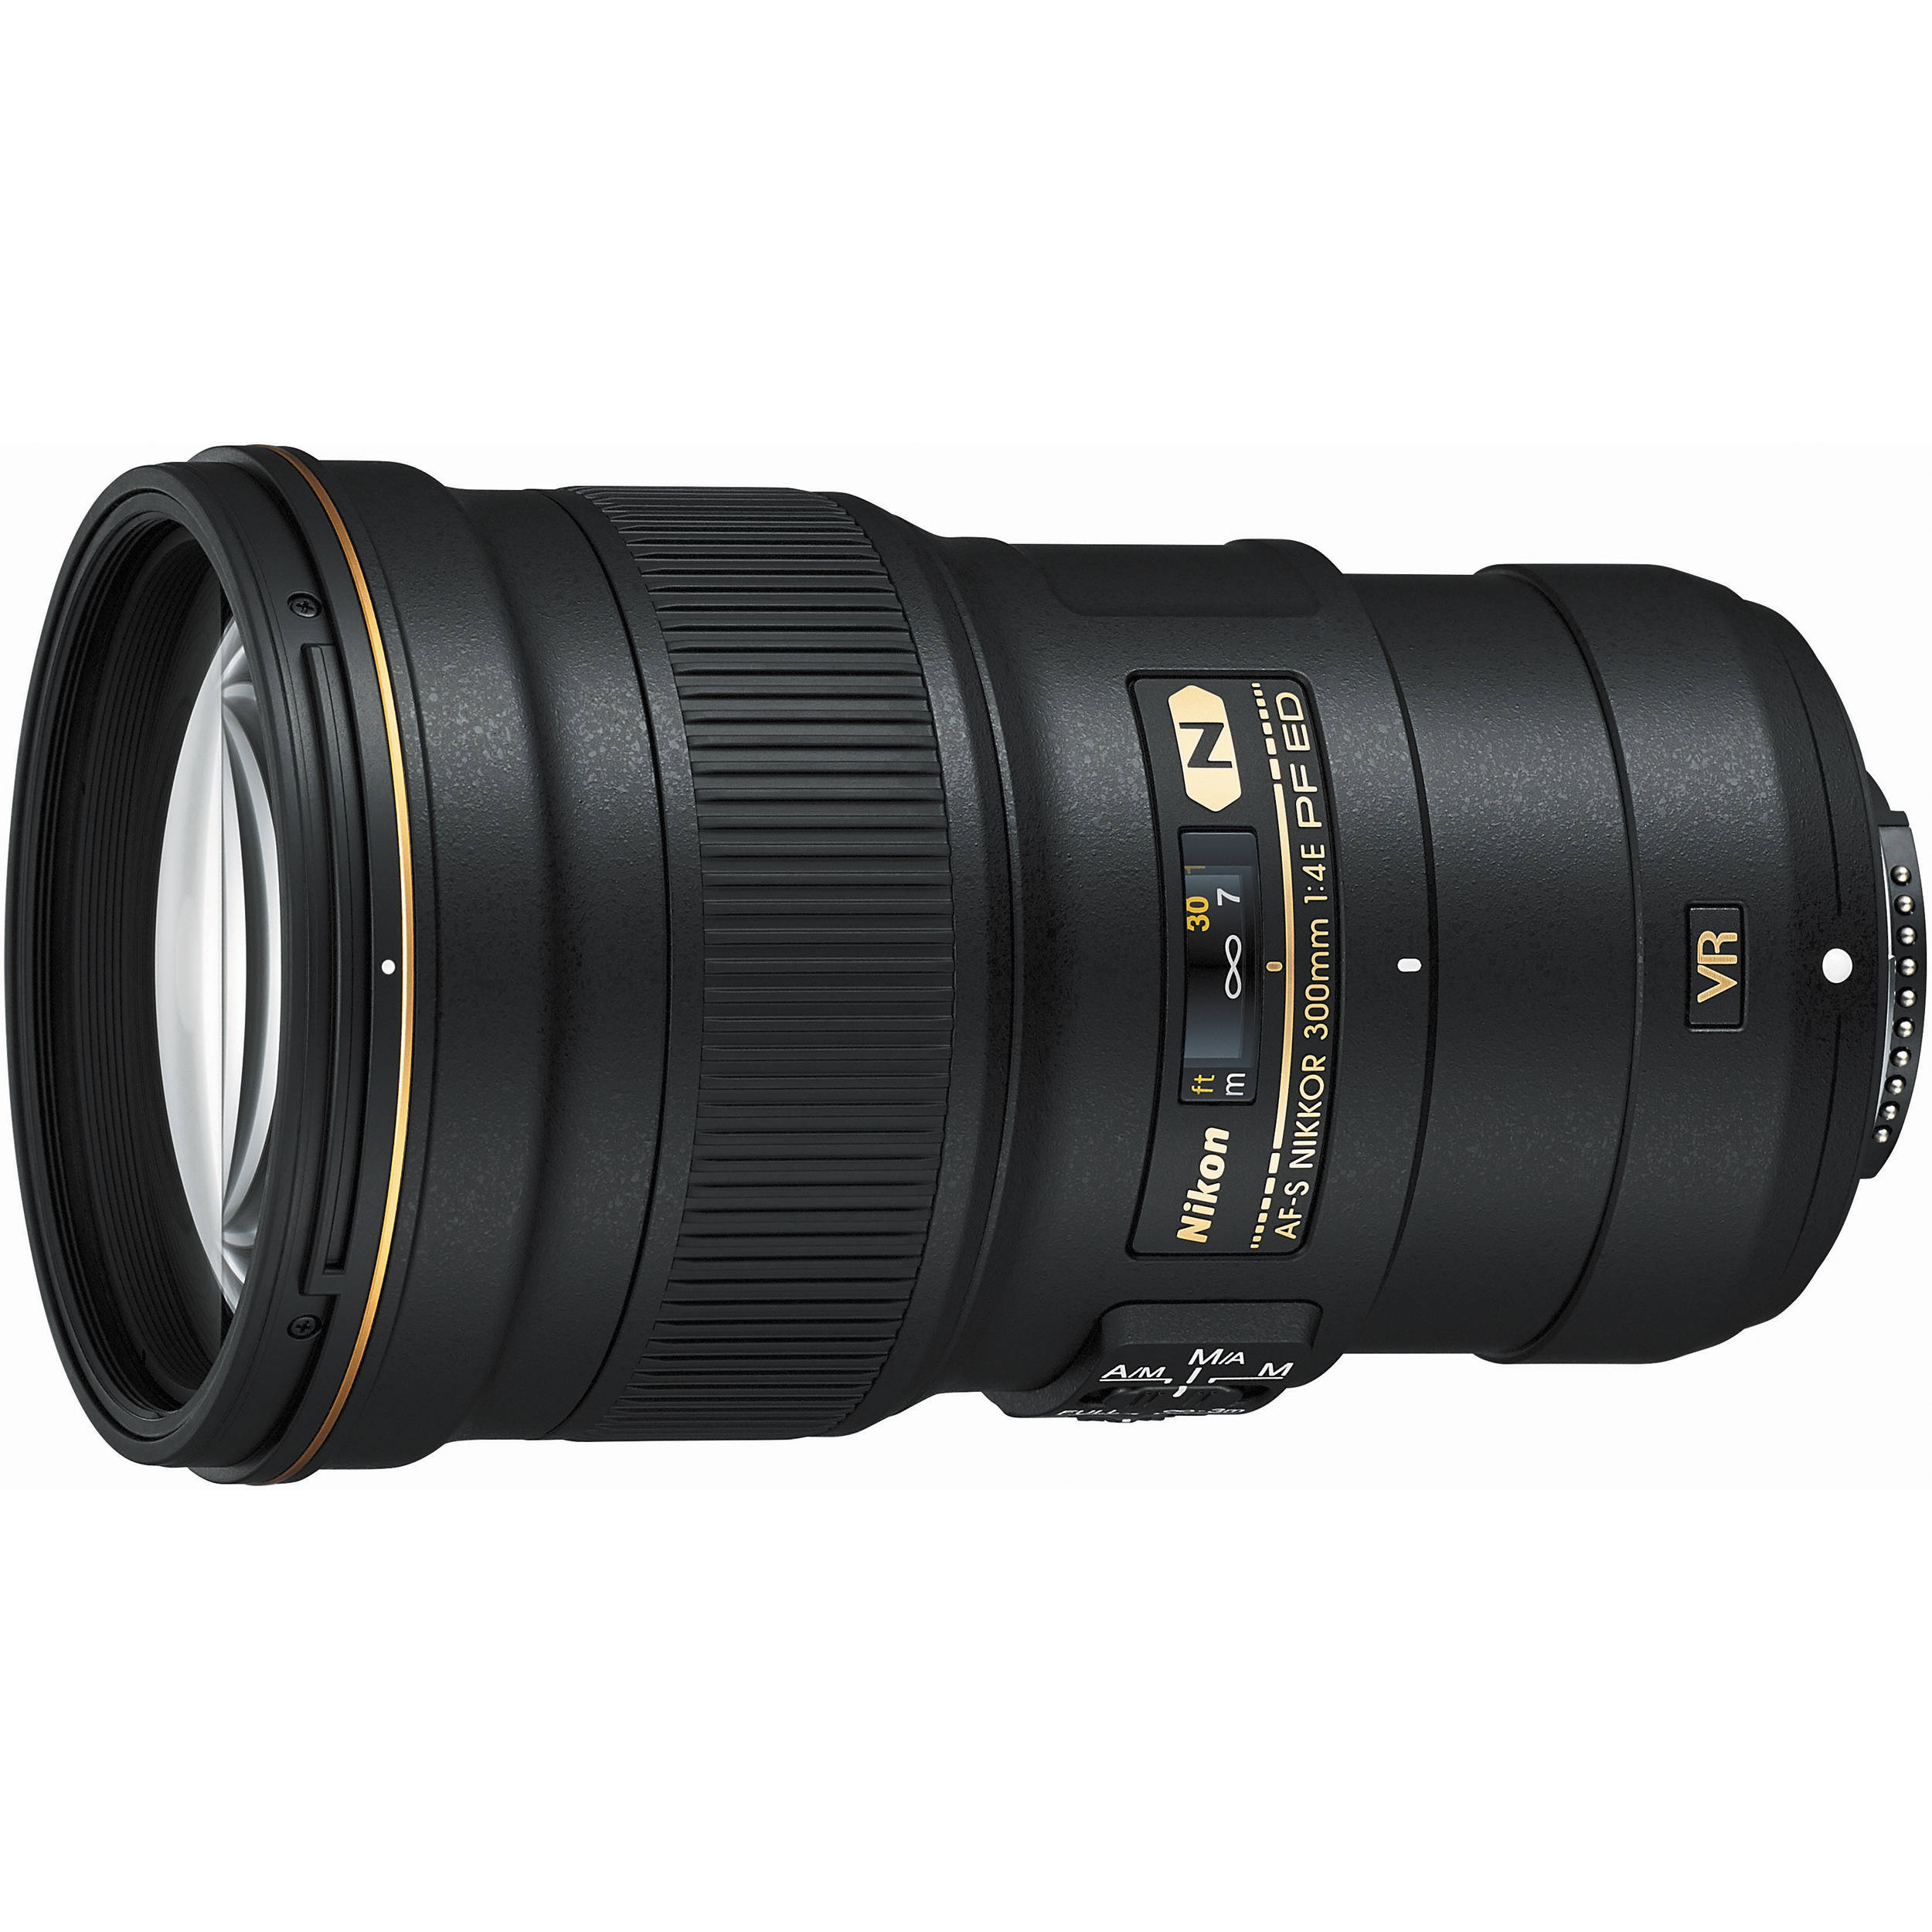 Nikon AF-S NIKKOR 300mm f/4E PF ED VR Lens 2223 B&H Photo ...